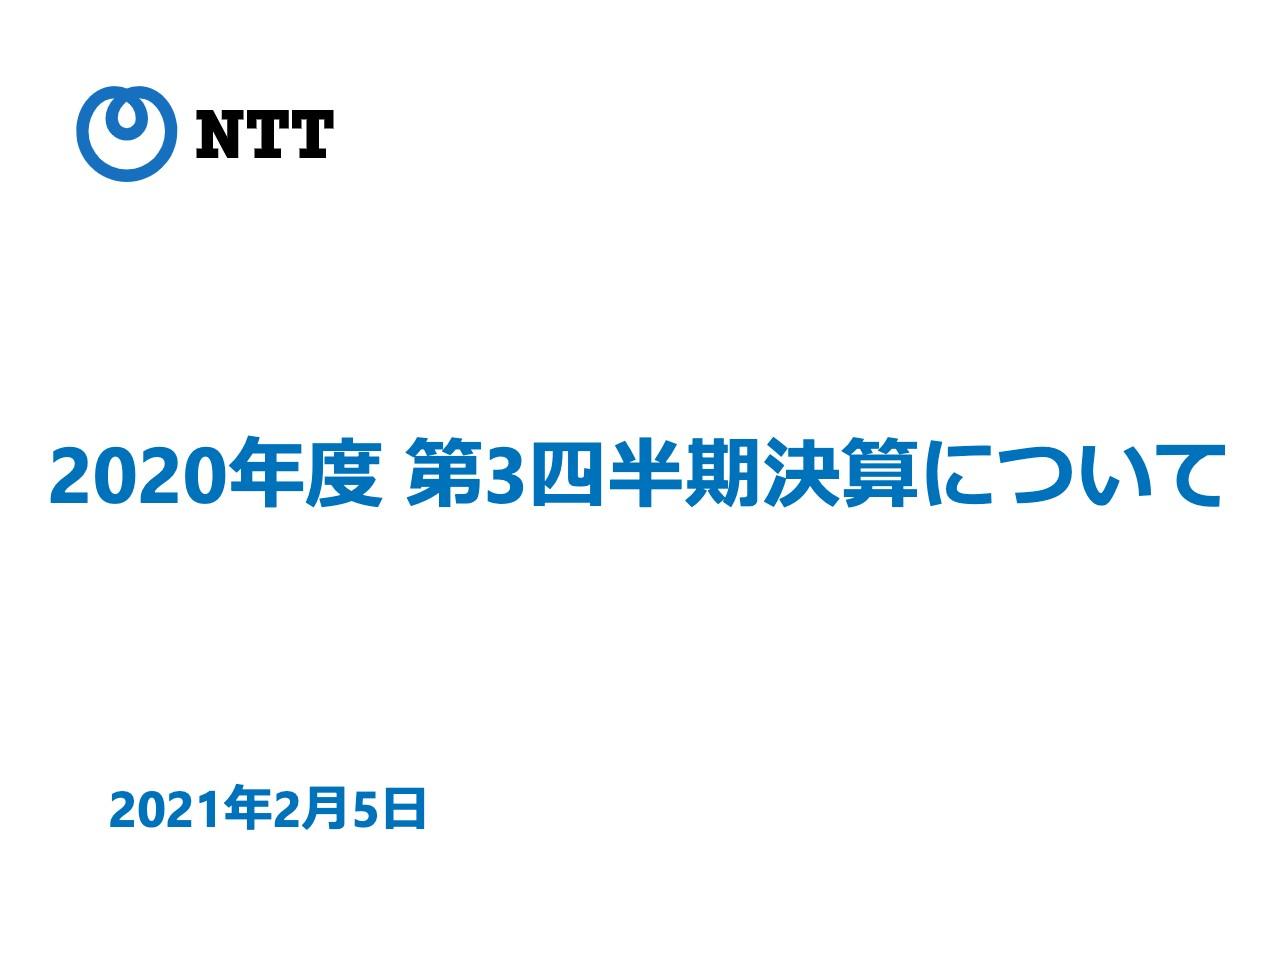 NTT、コロナ禍で3Qの営業収益は減収も、営業利益はドコモスマートライフ事業の増益が寄与し前年比+519億円